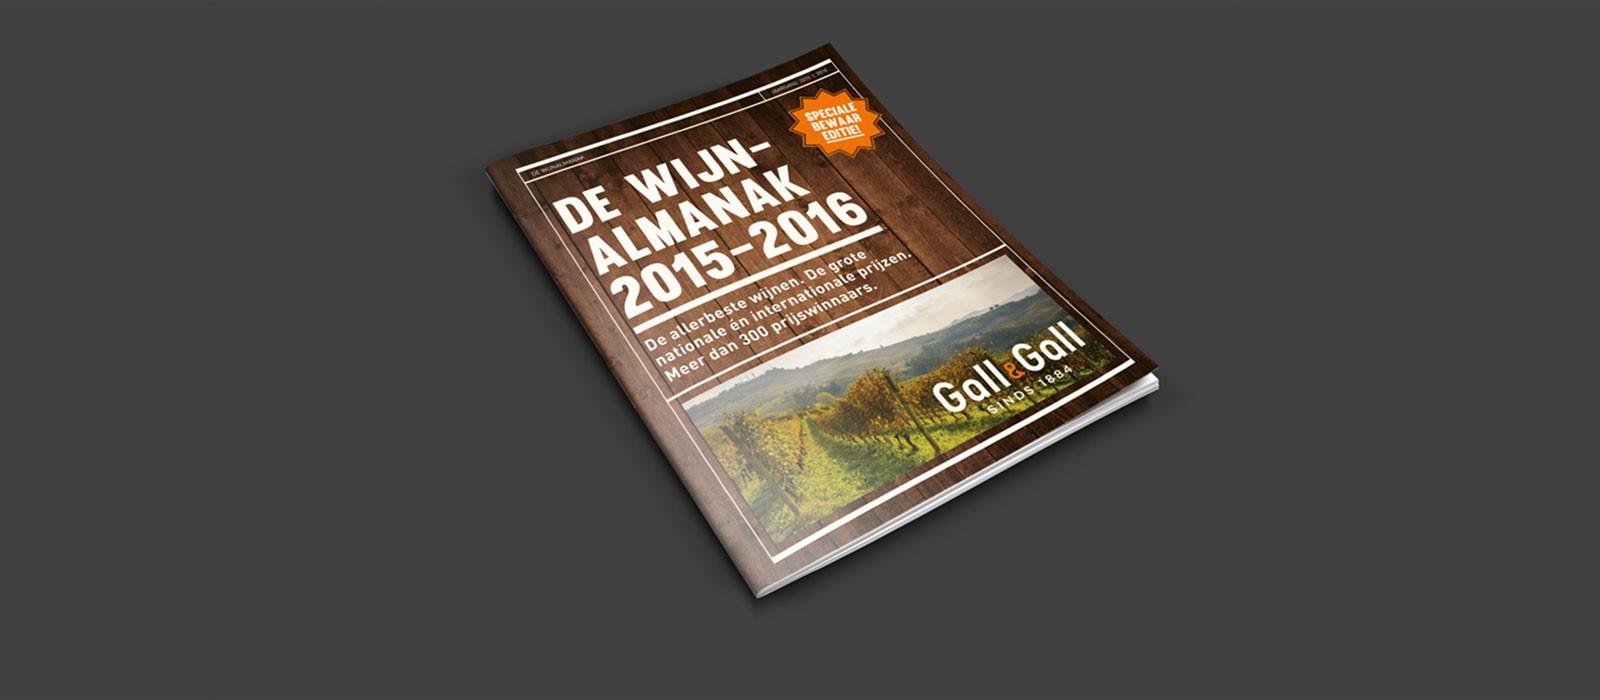 GH-Gall-cover-1600-print